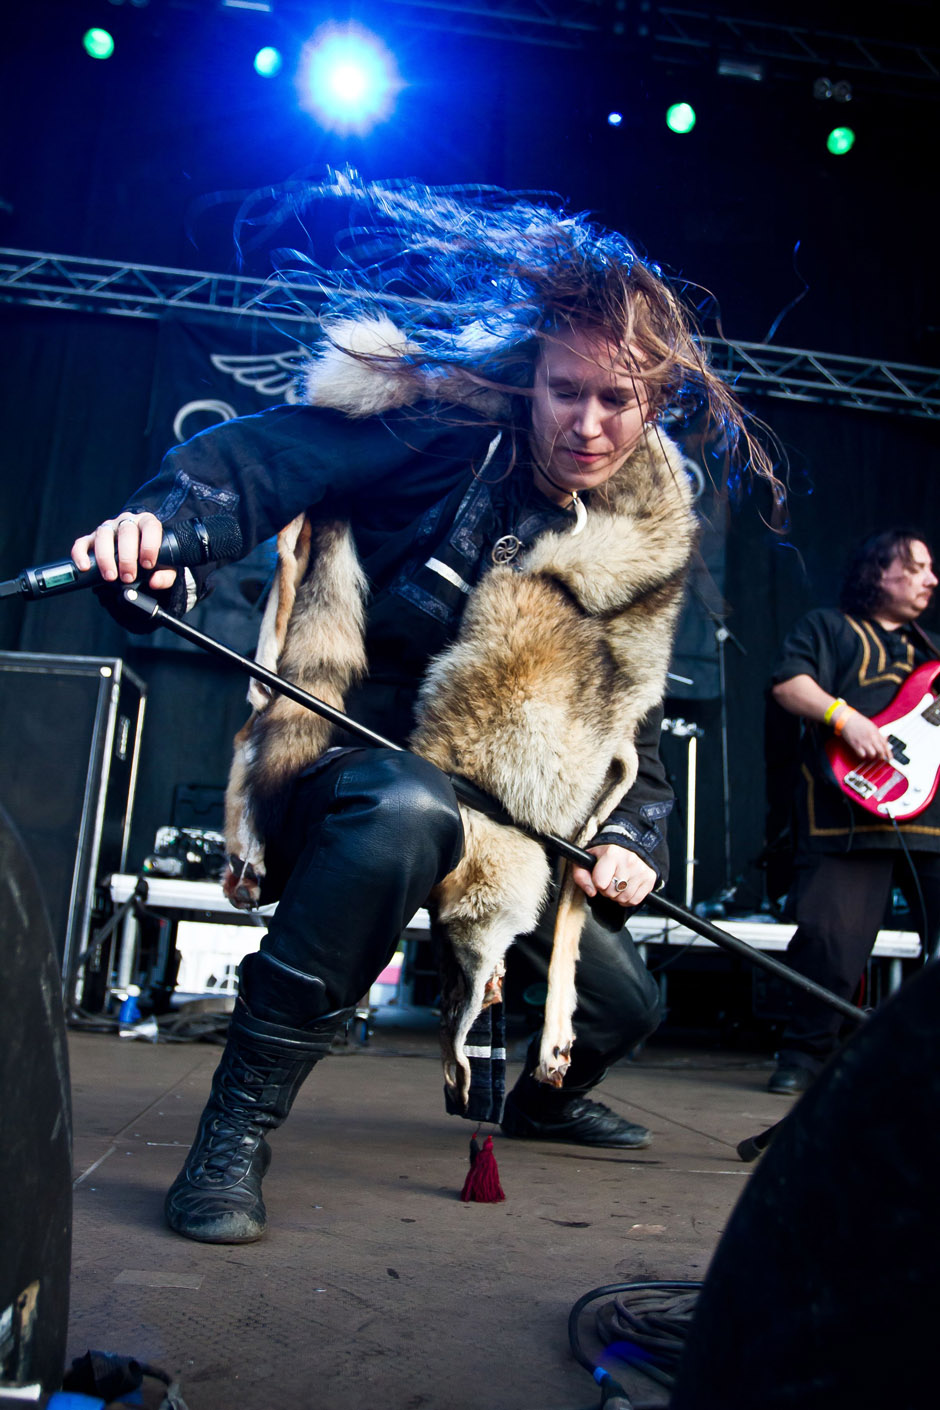 Arkona live, Extremefest 2012 in Hünxe